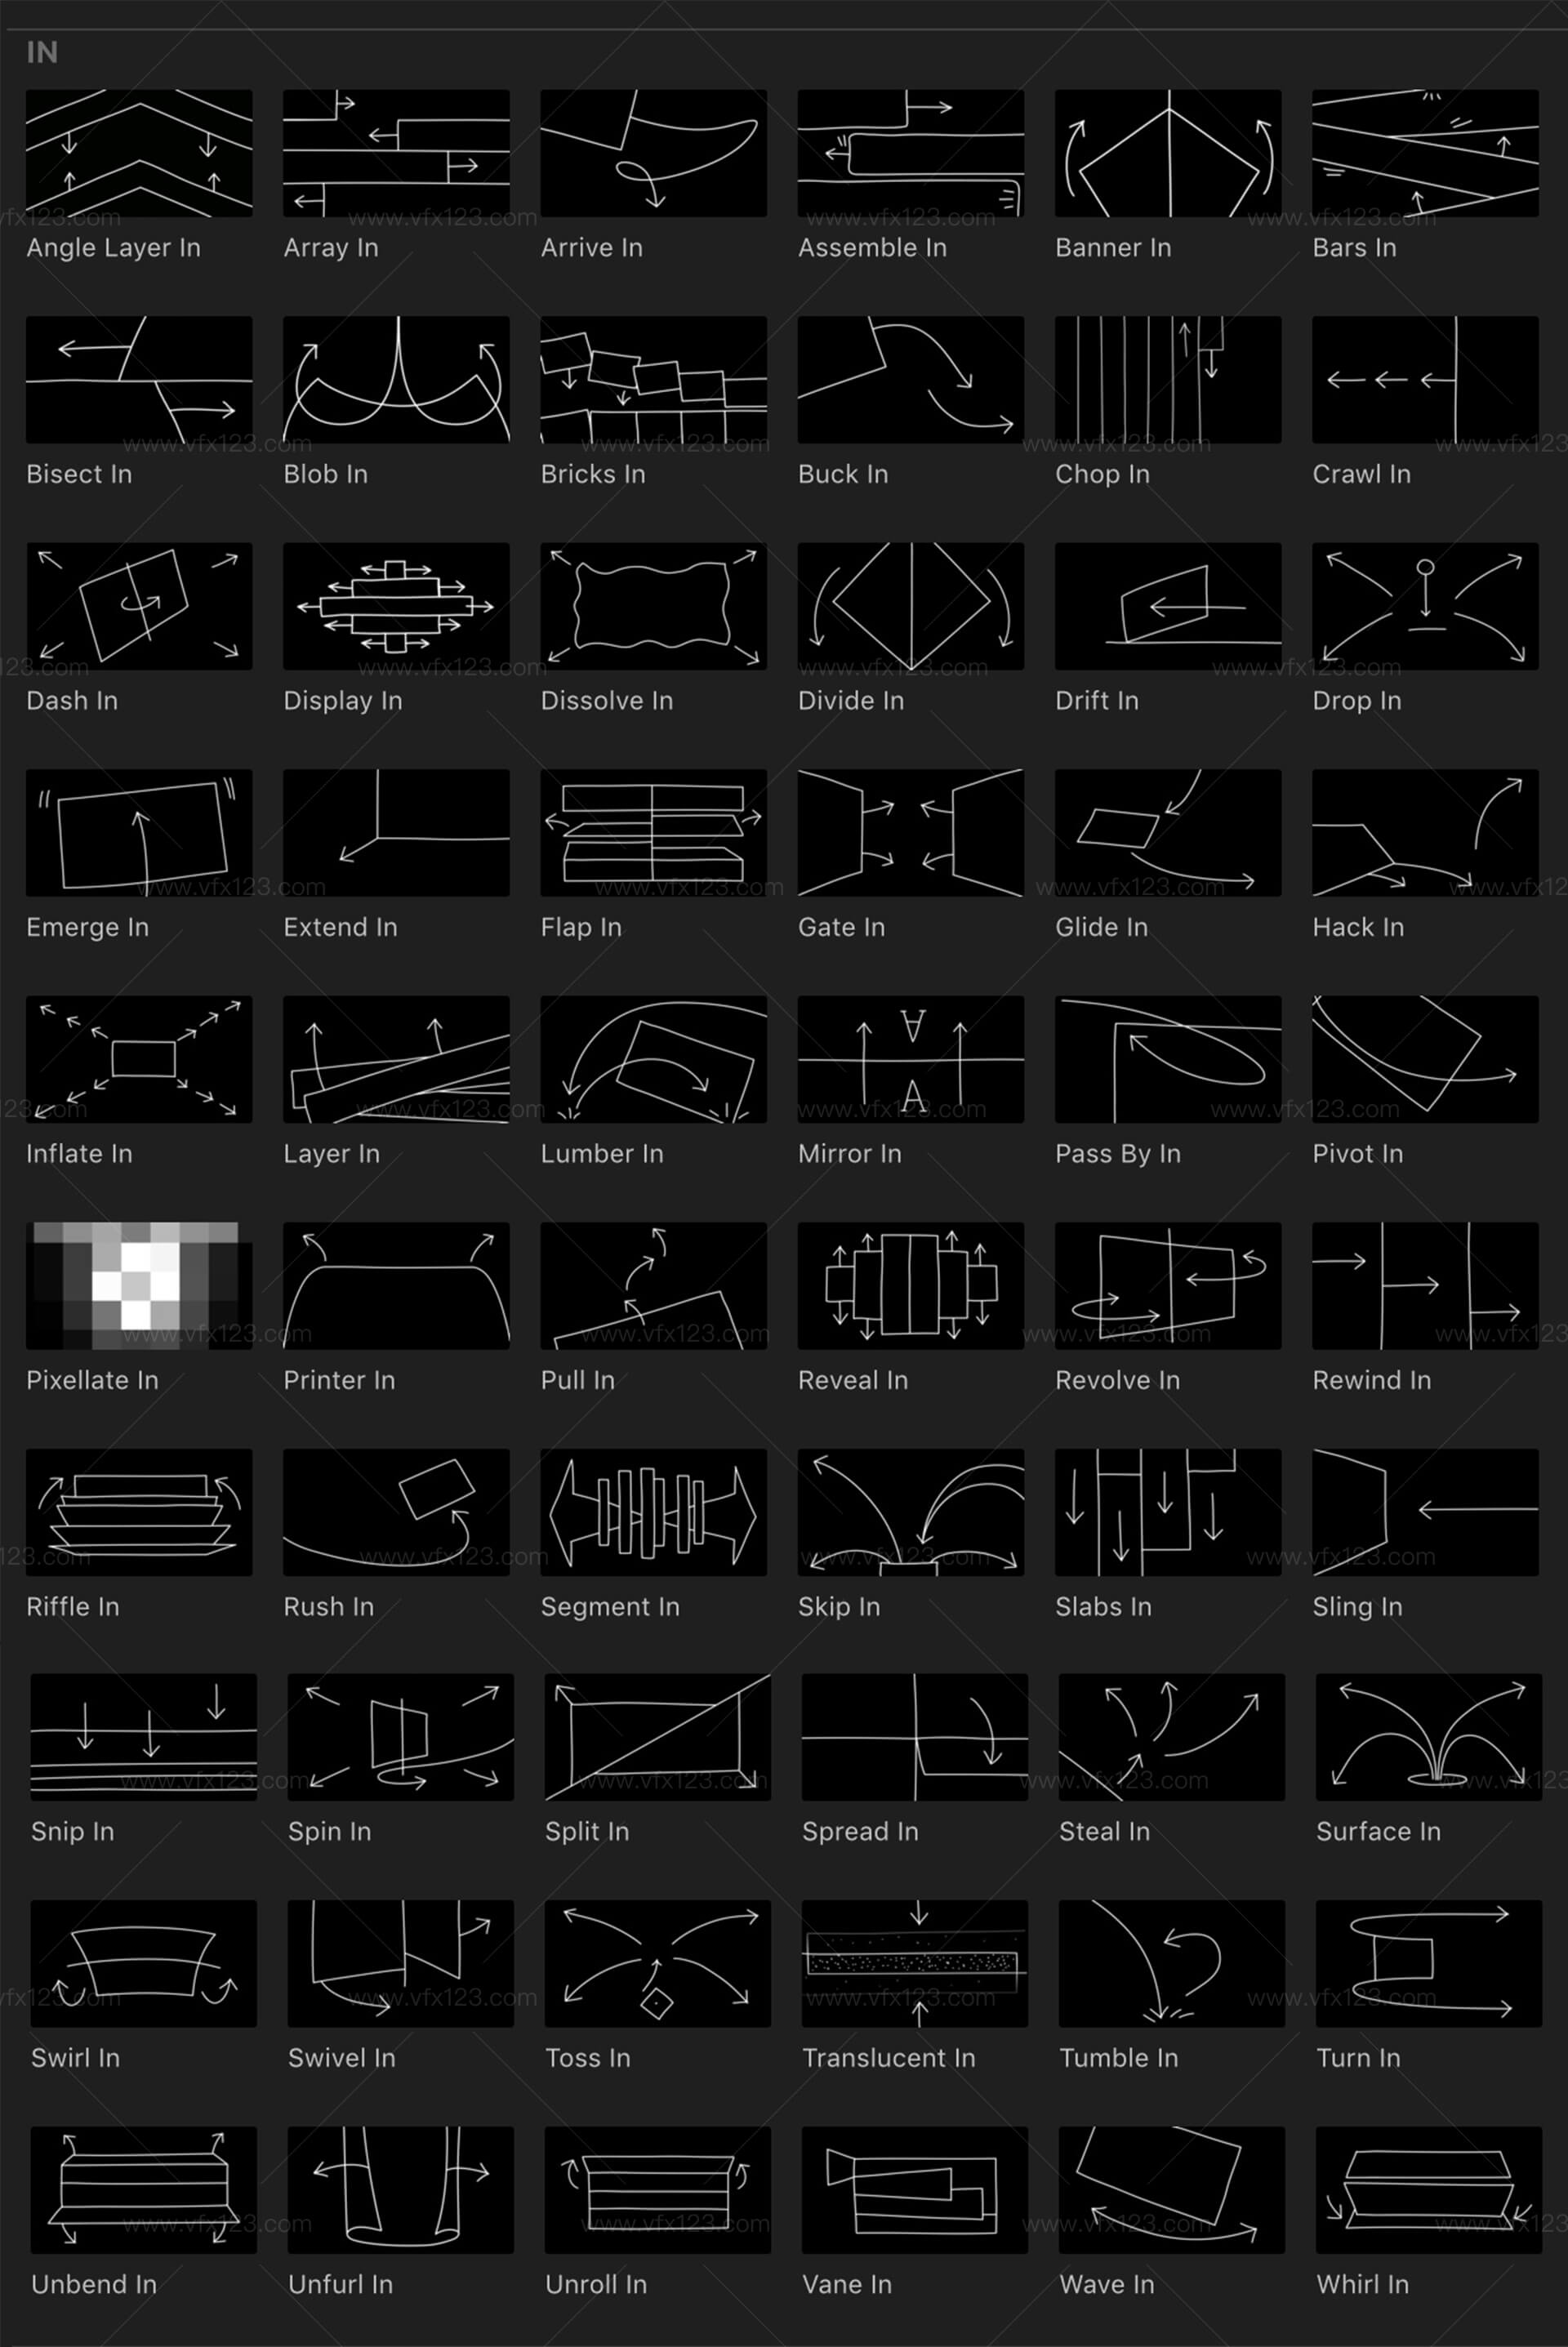 mBehavior 2 160种MG图形动画动作预设效果插件